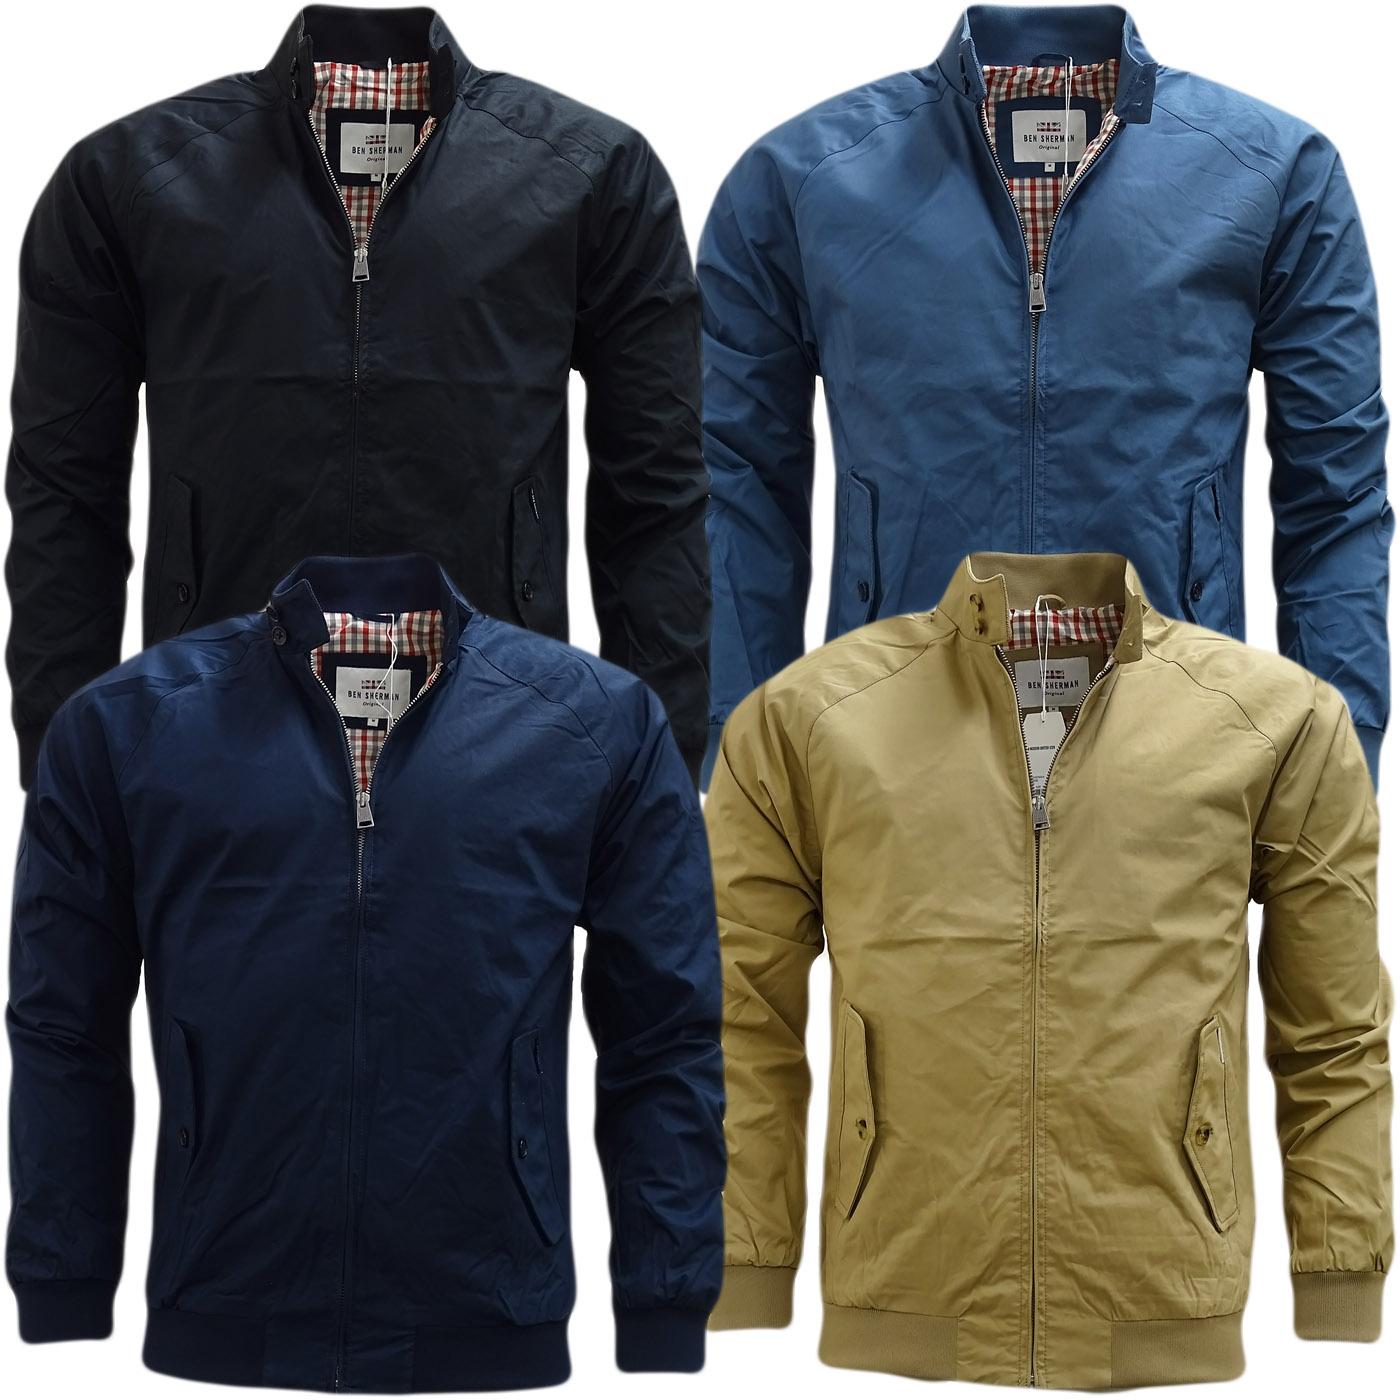 Ben Sherman Harrington Gingham Lining Jacket / Coat - Mf13639